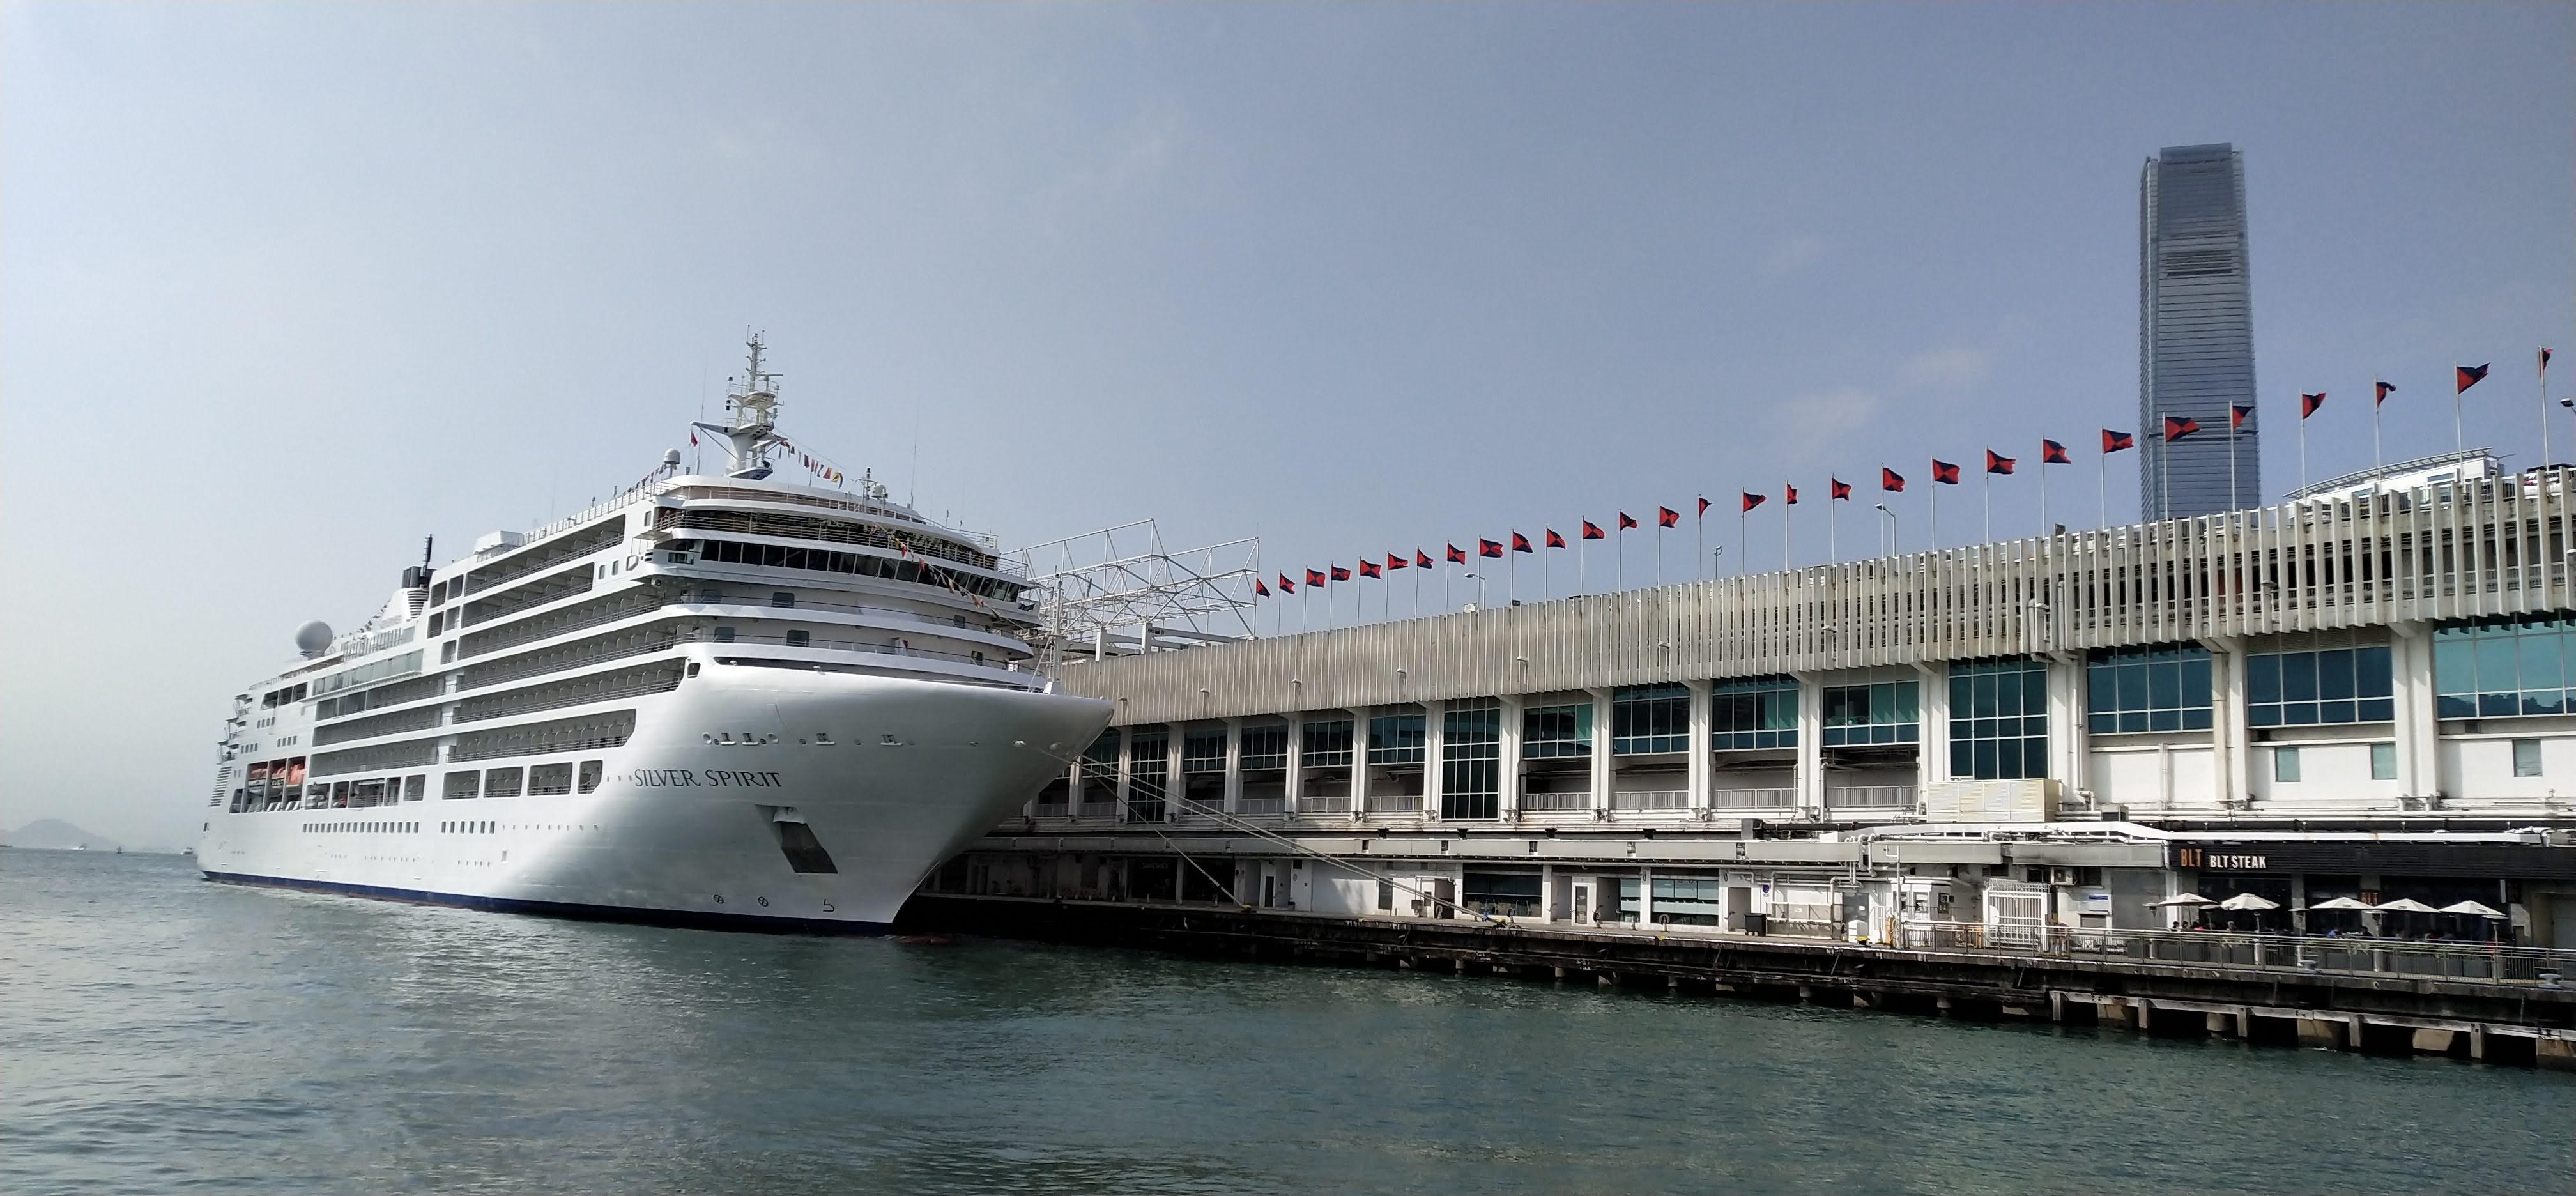 Silver Moon's sister ship, Silver Spirit came to Hong Kong in 2018.